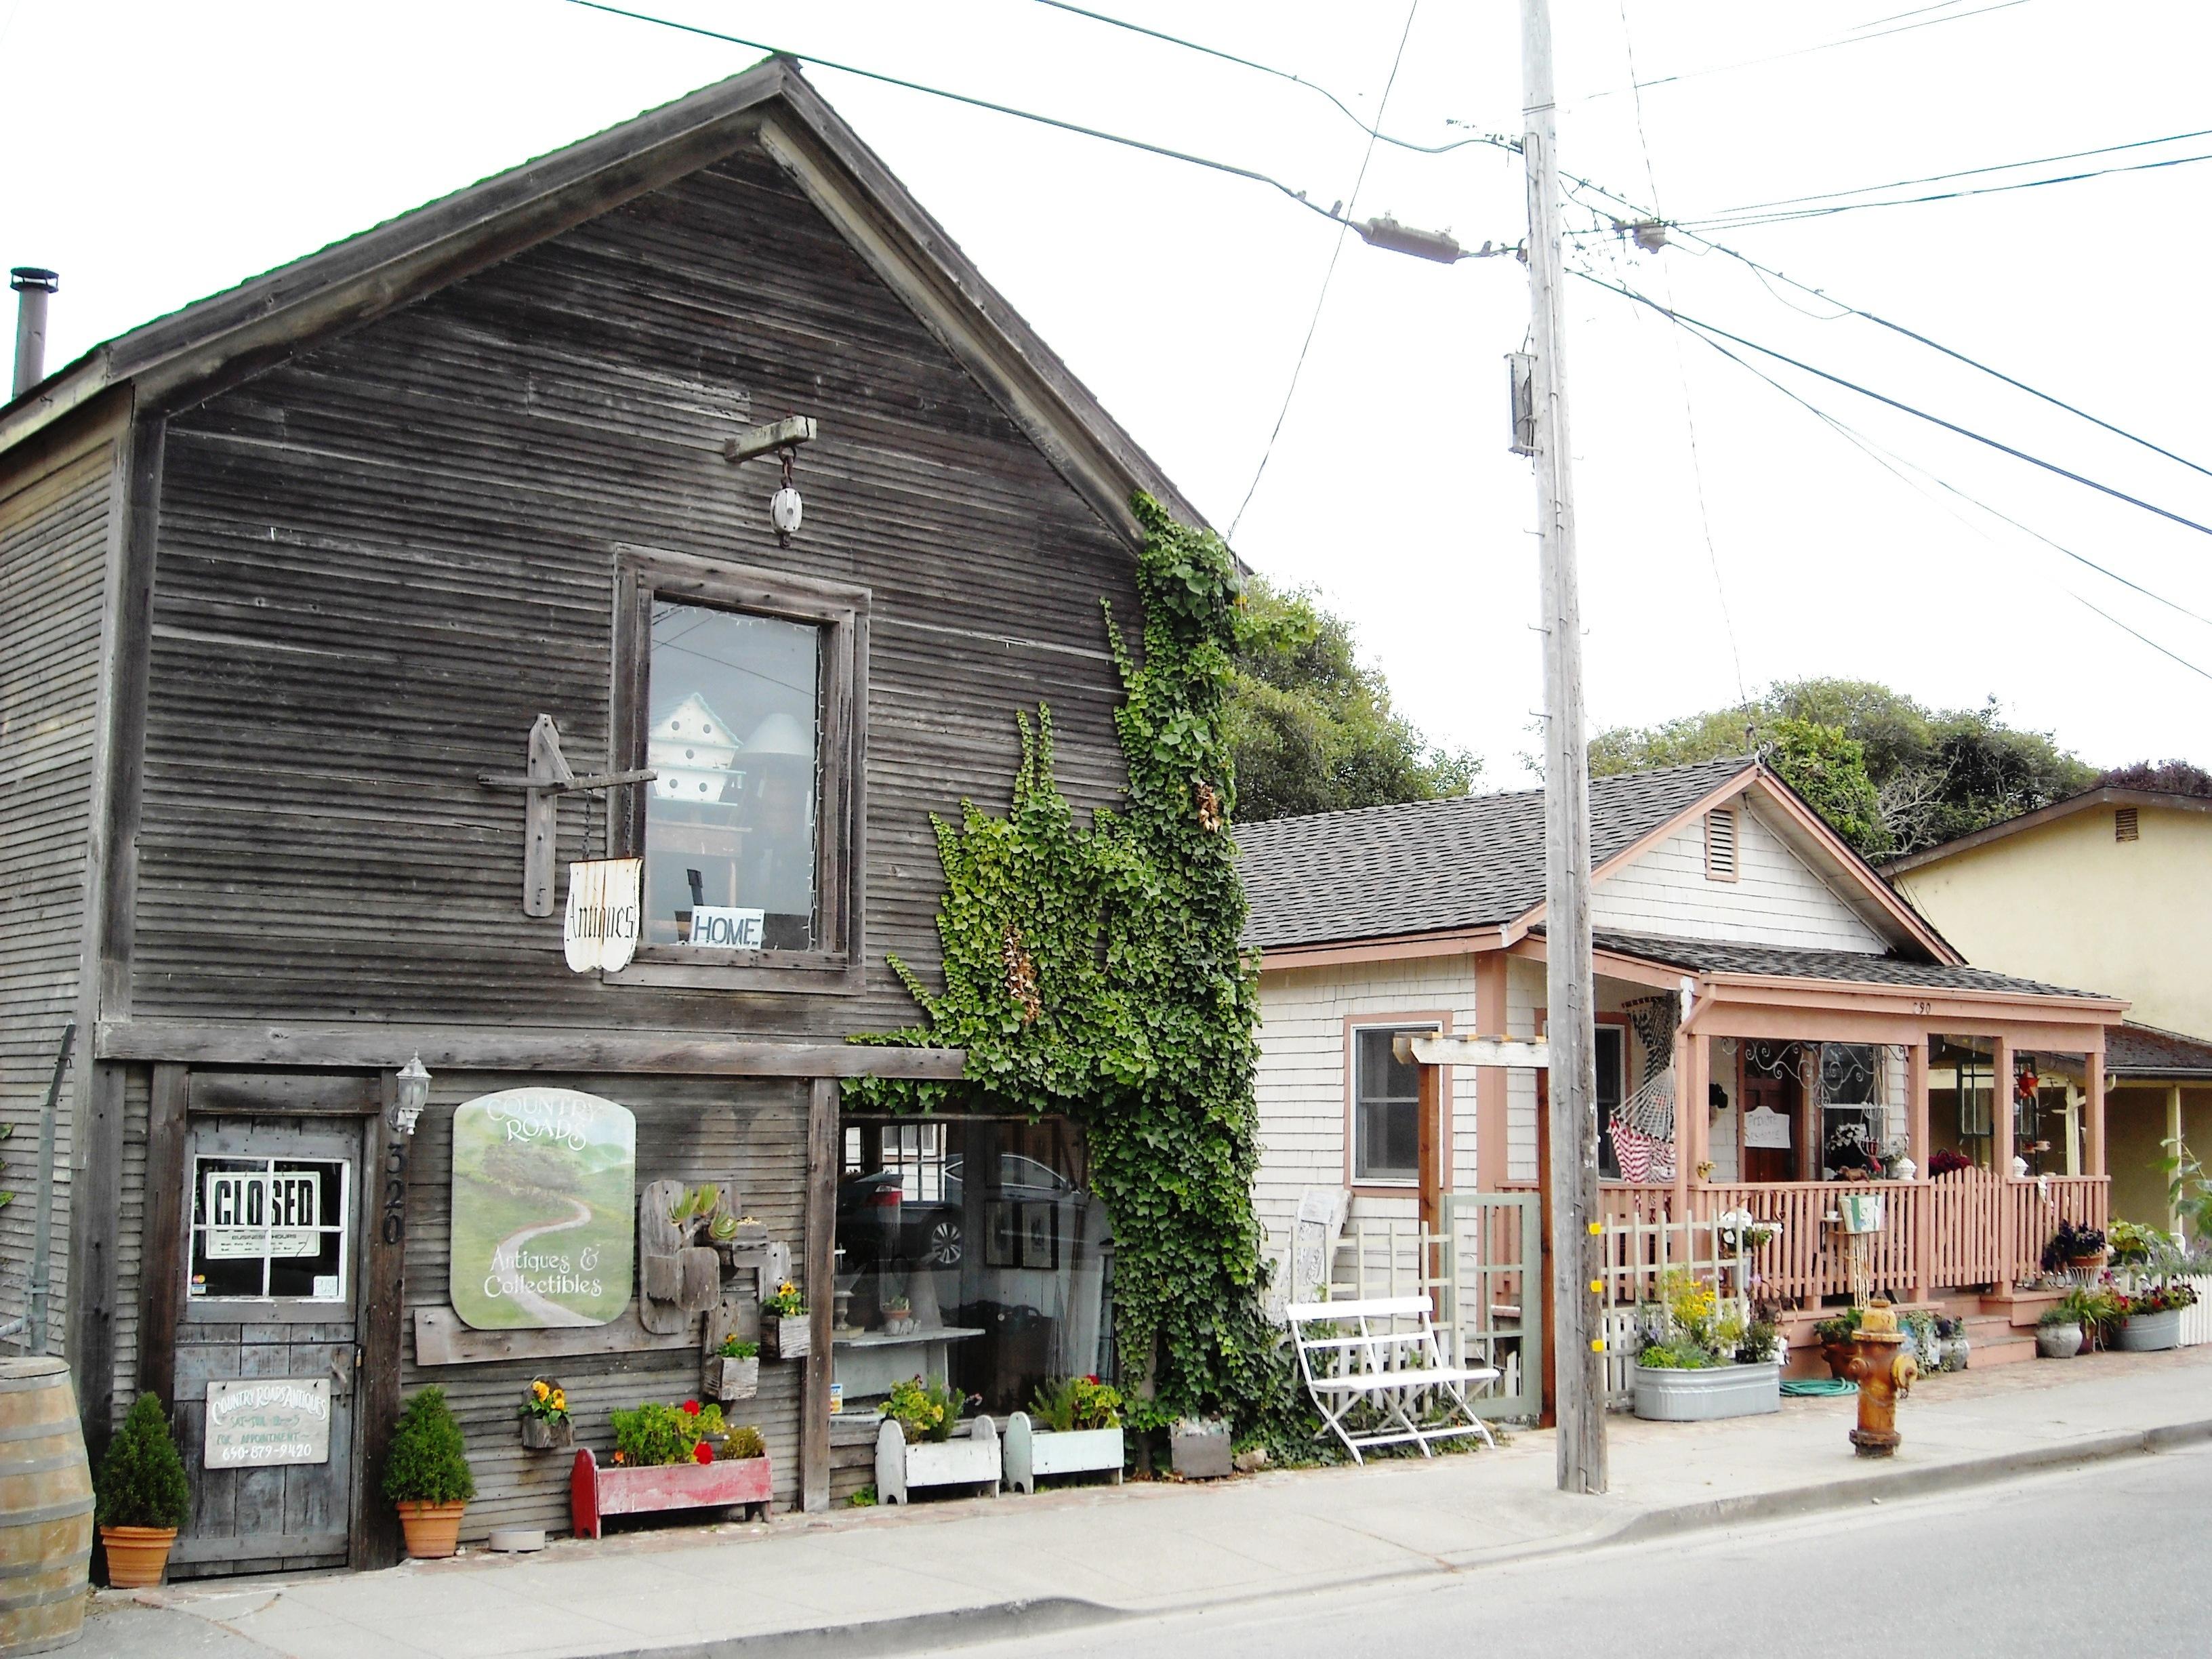 California san mateo county pescadero - Old Town Pescadero California